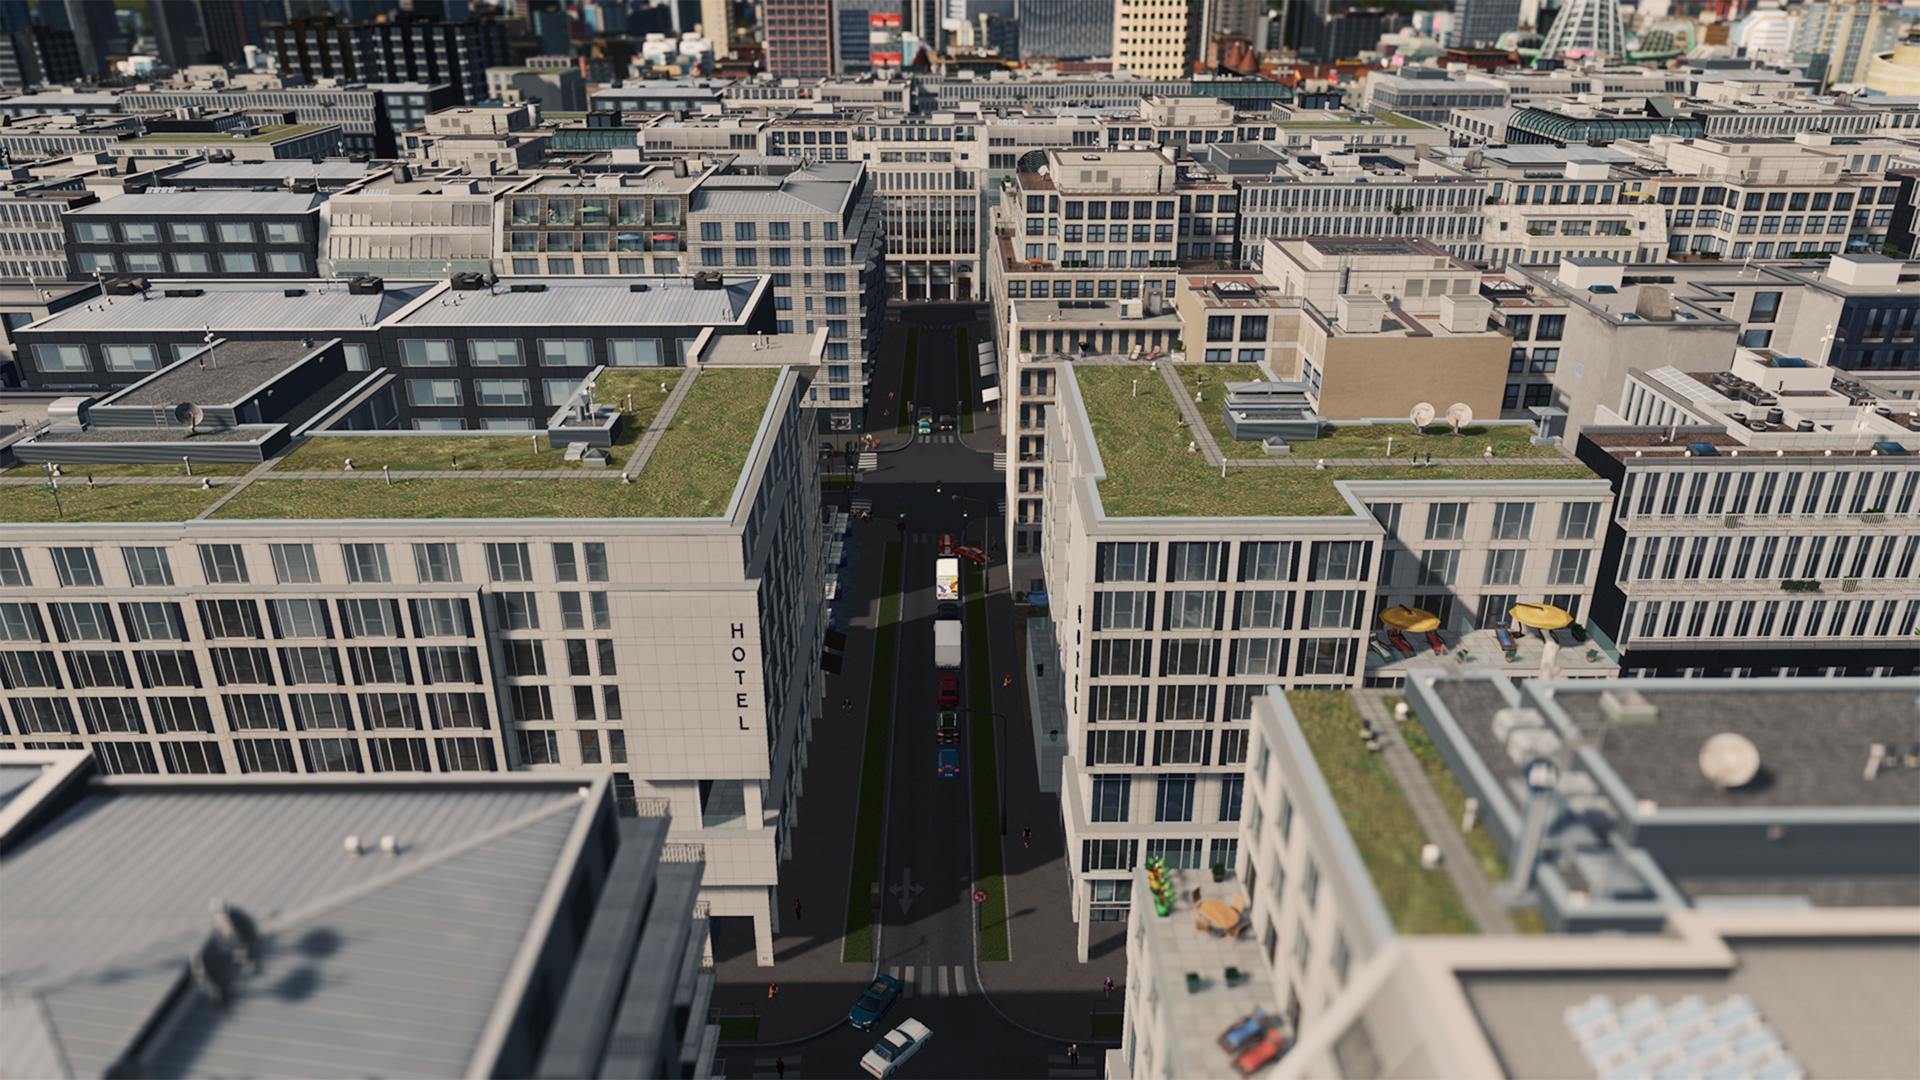 Cities: Skylines - Downtown Bundle   ROW (80110a02-5848-4f66-887b-e5a0b61ee1d8)